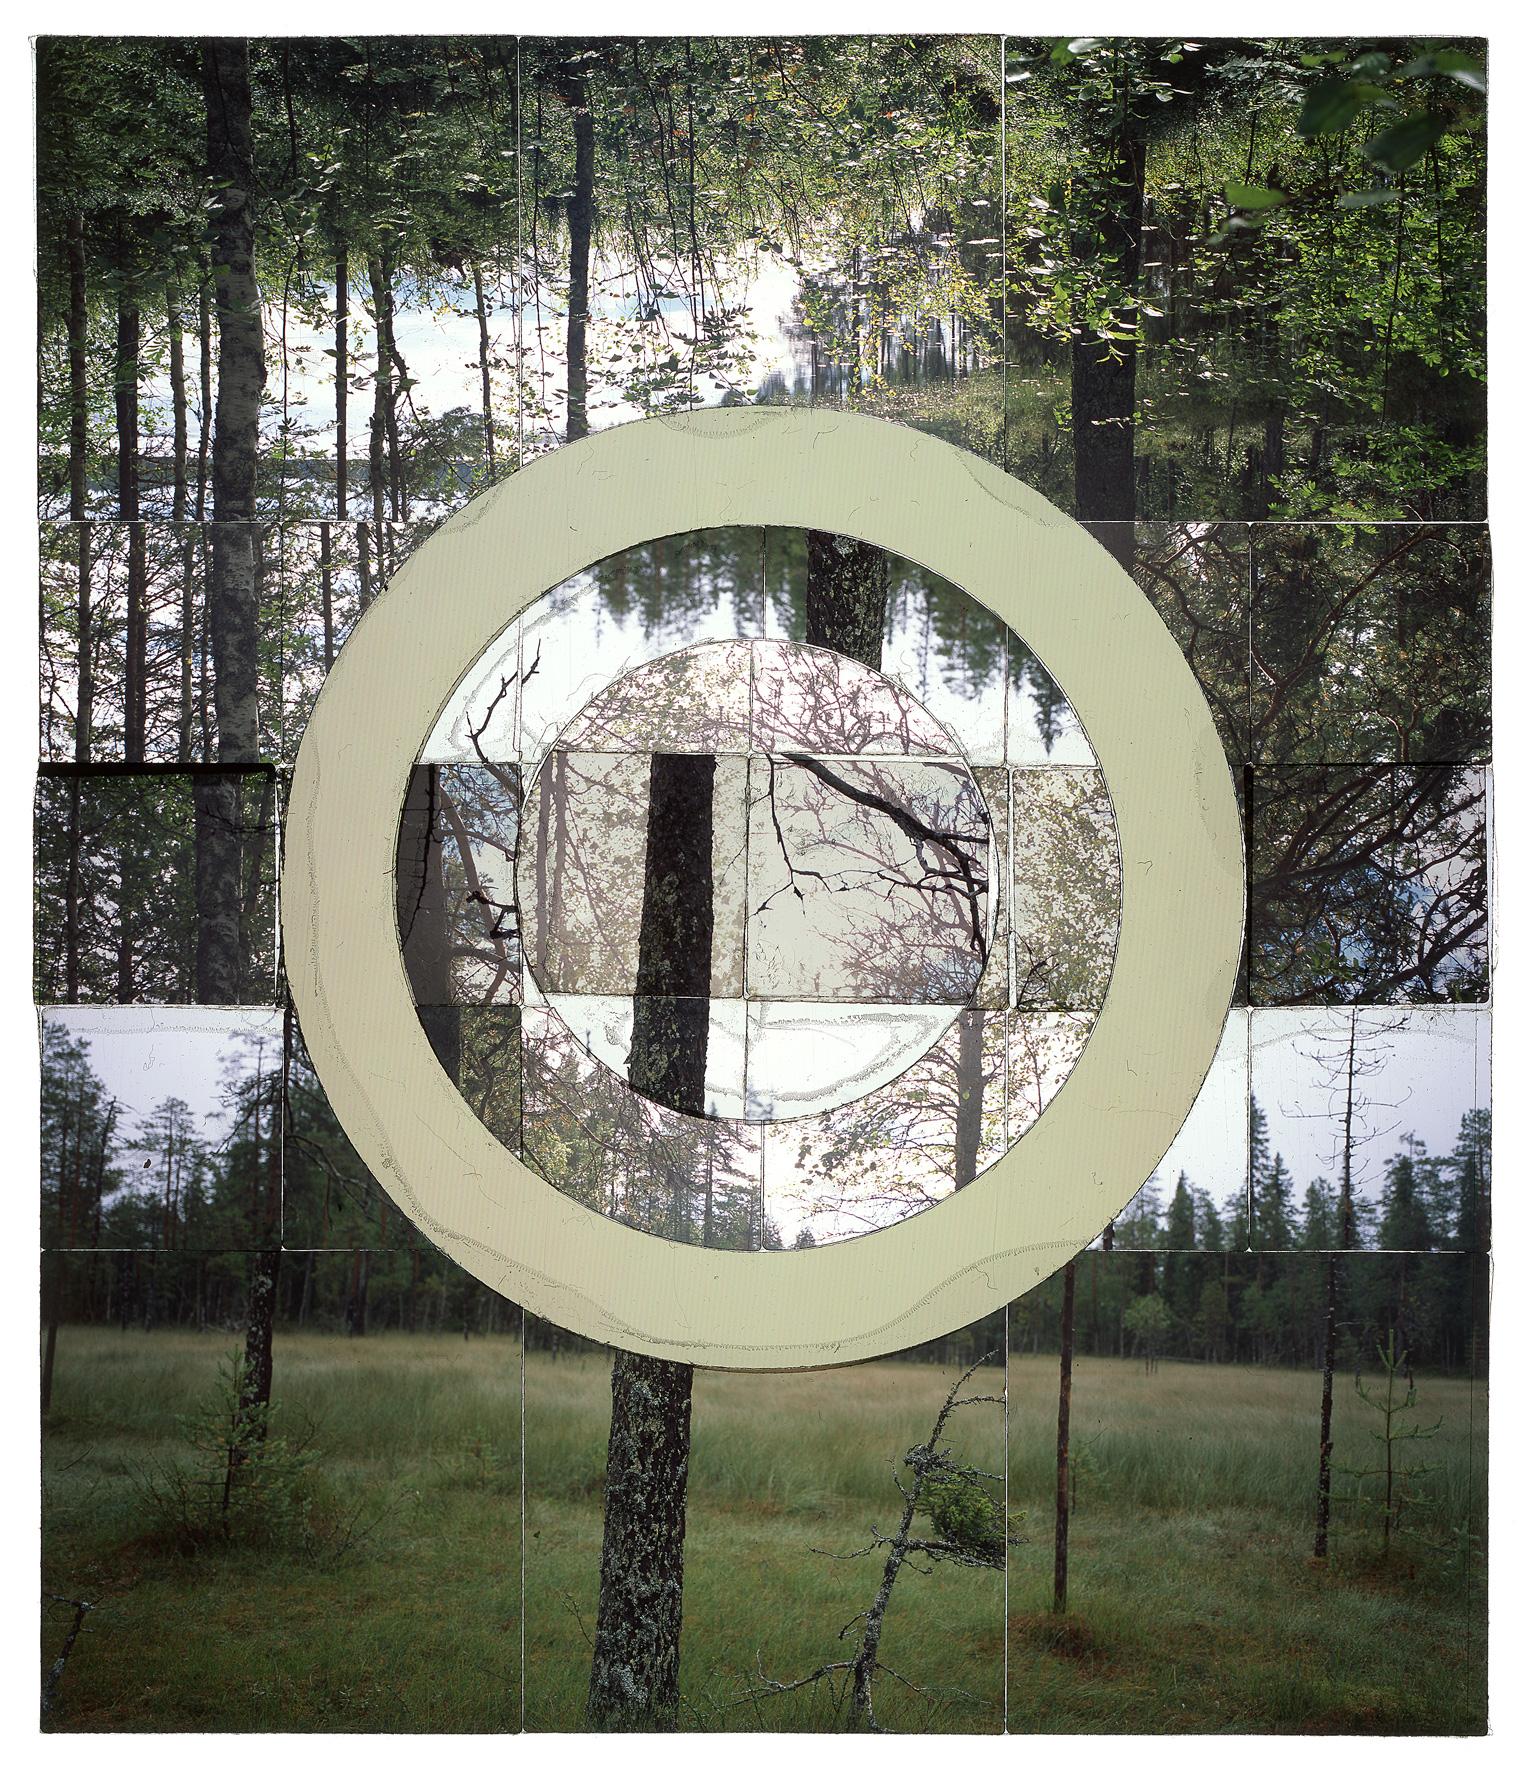 "SYVÄLAMPI, FINLAND - 30""x36"" (76cmx91cm) • TRANSPARENCY FILM PRINT, ARCHIVAL PIGMENT ON FUJI LUSTRE  (EDITION OF 5)"